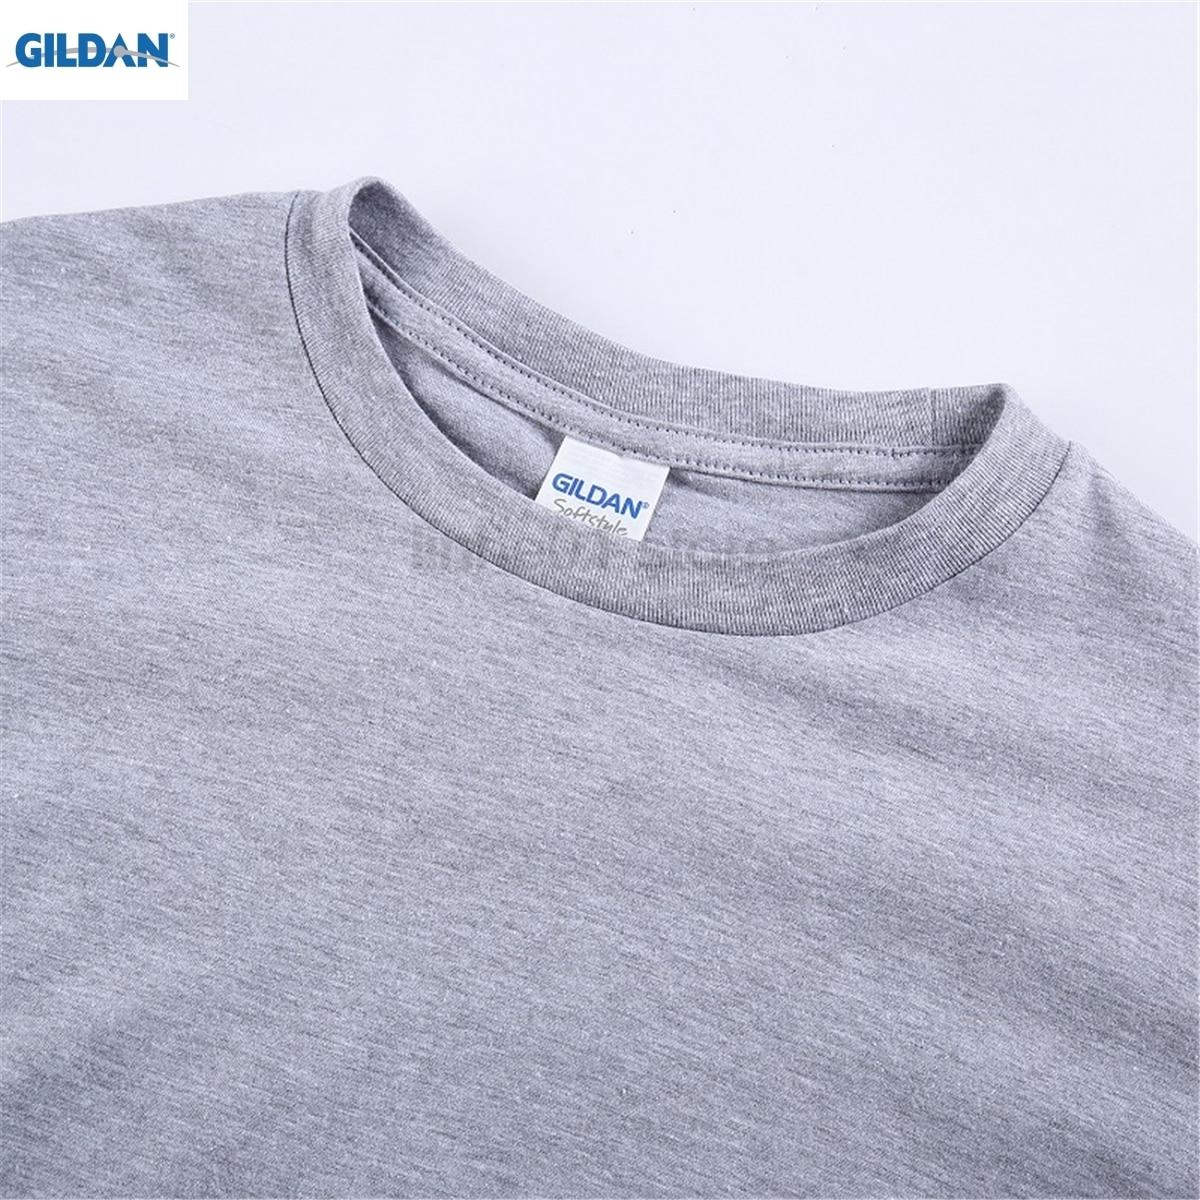 GILDAN BURN OUT Lettering Dress female T-shirt